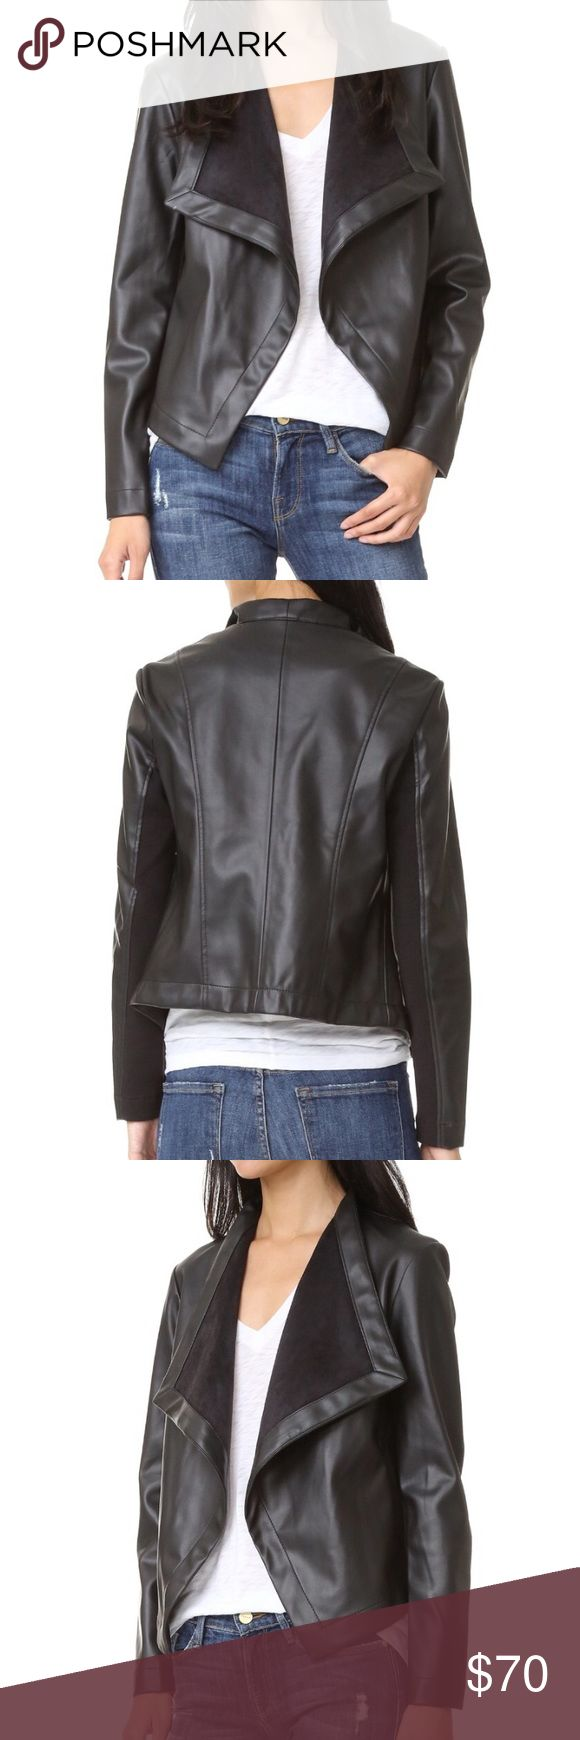 BB Dakota vegan drape jacket NWT Please see image 5 for details BB Dakota Jackets & Coats